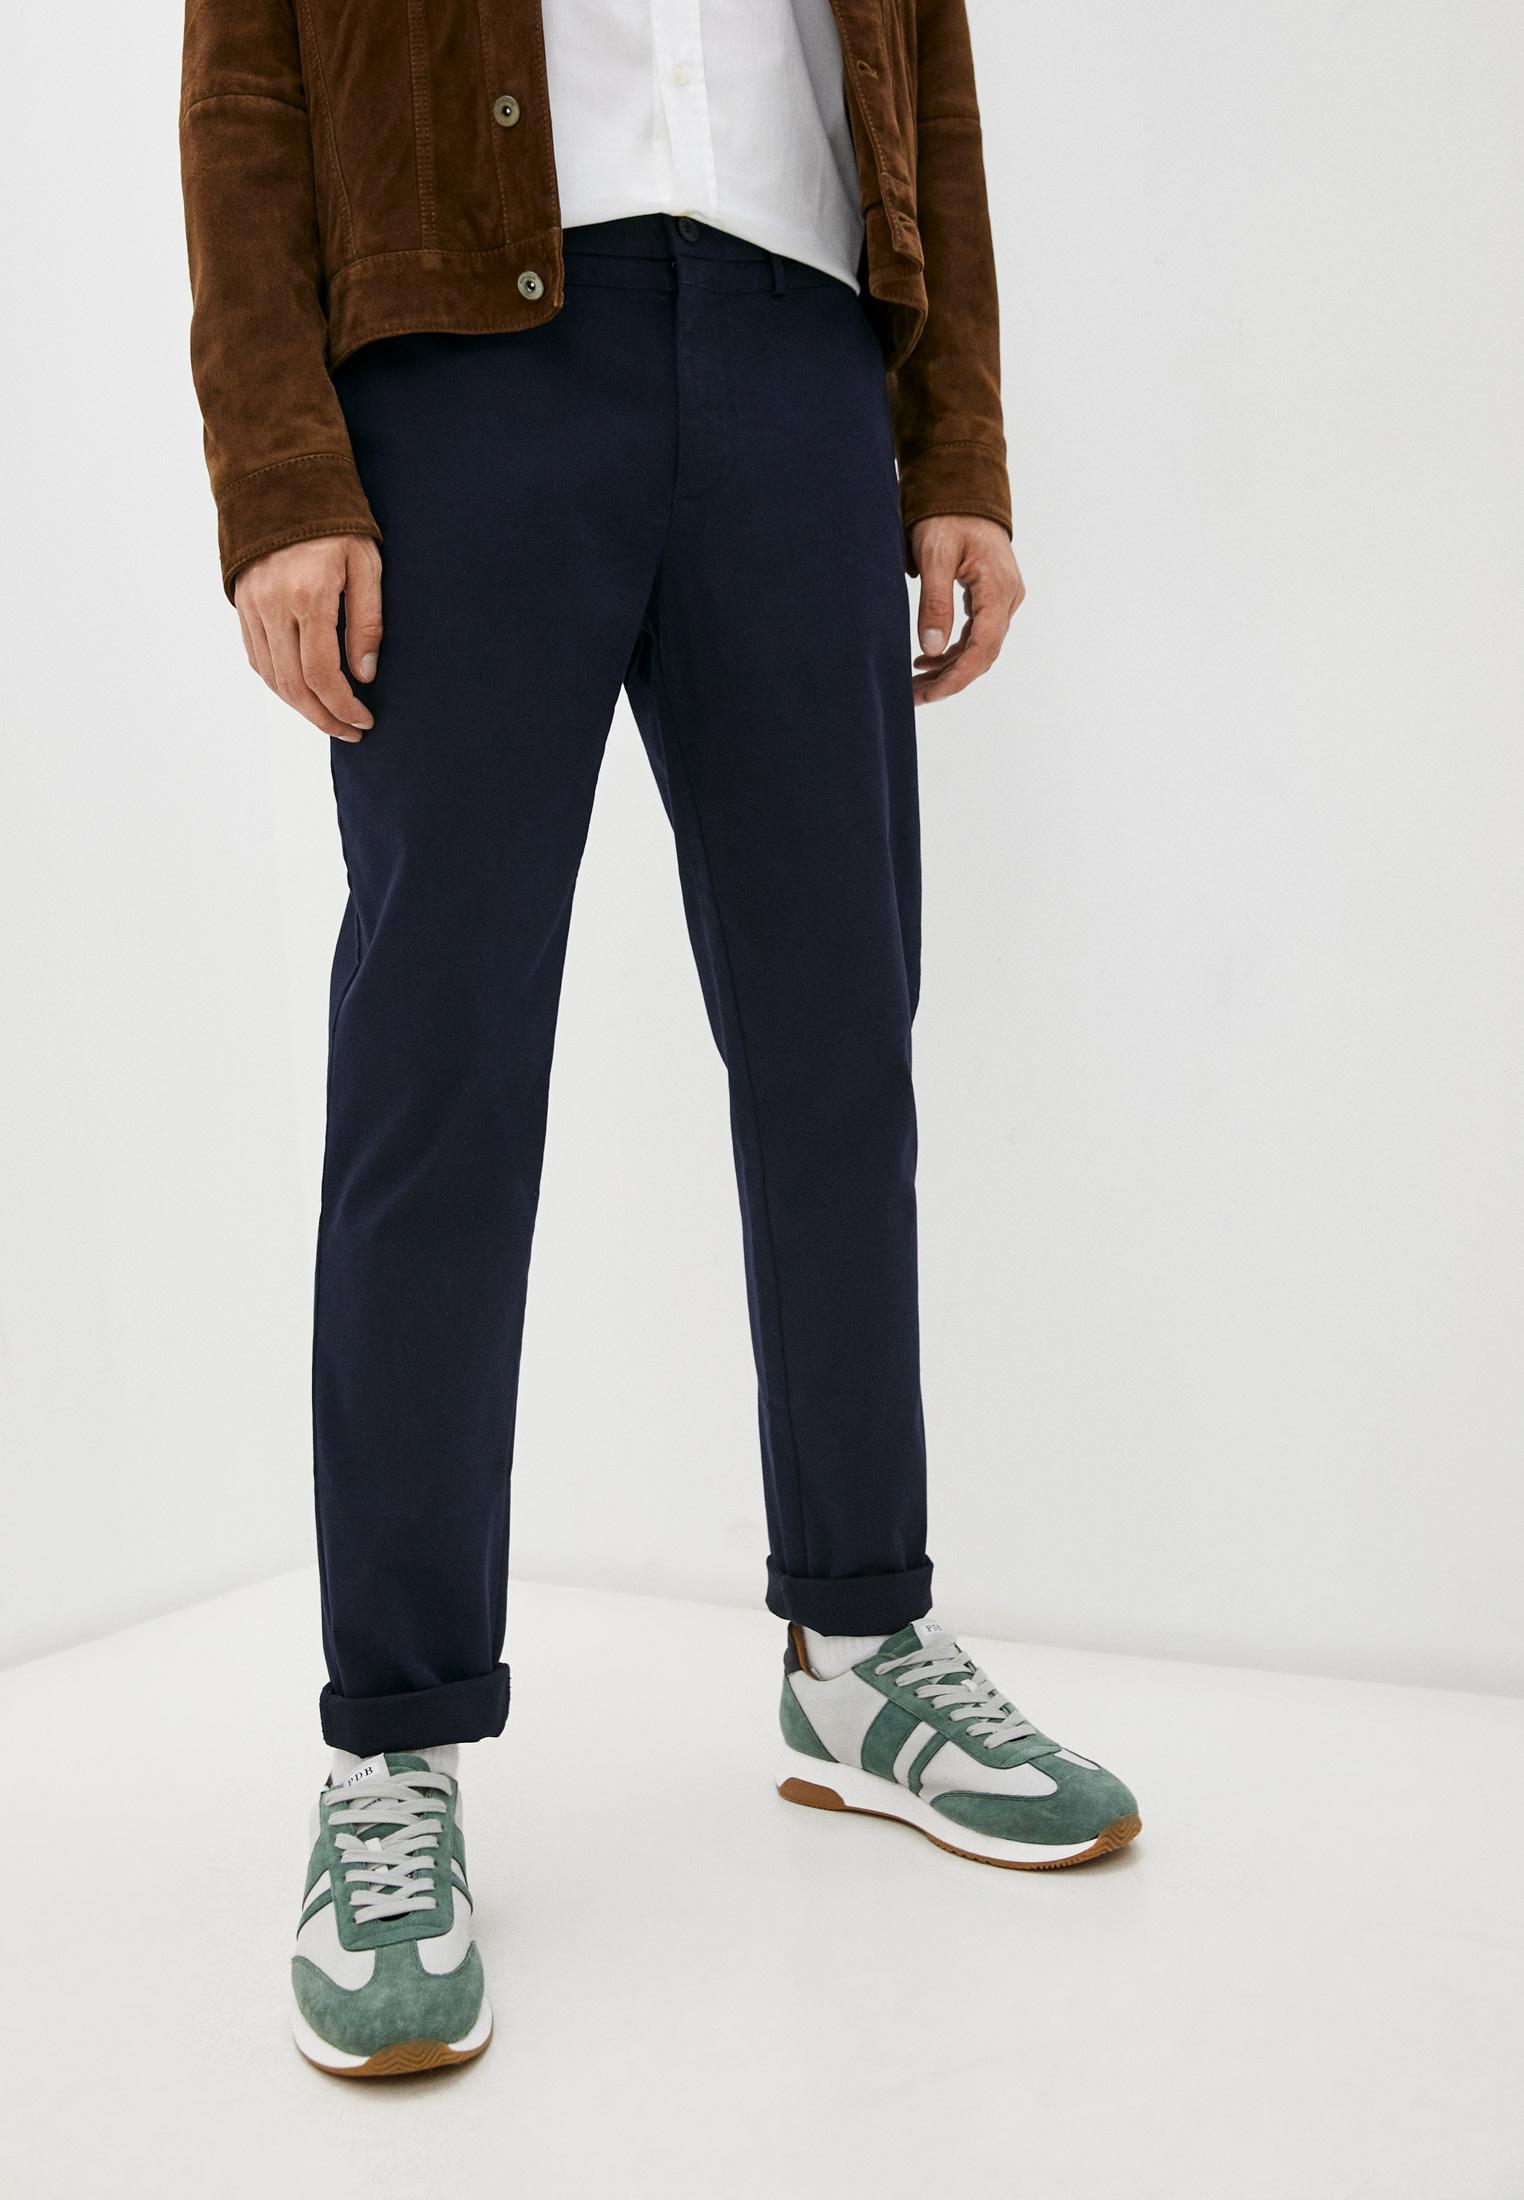 Мужские повседневные брюки Bikkembergs (Биккембергс) C P 035 01 S 3330